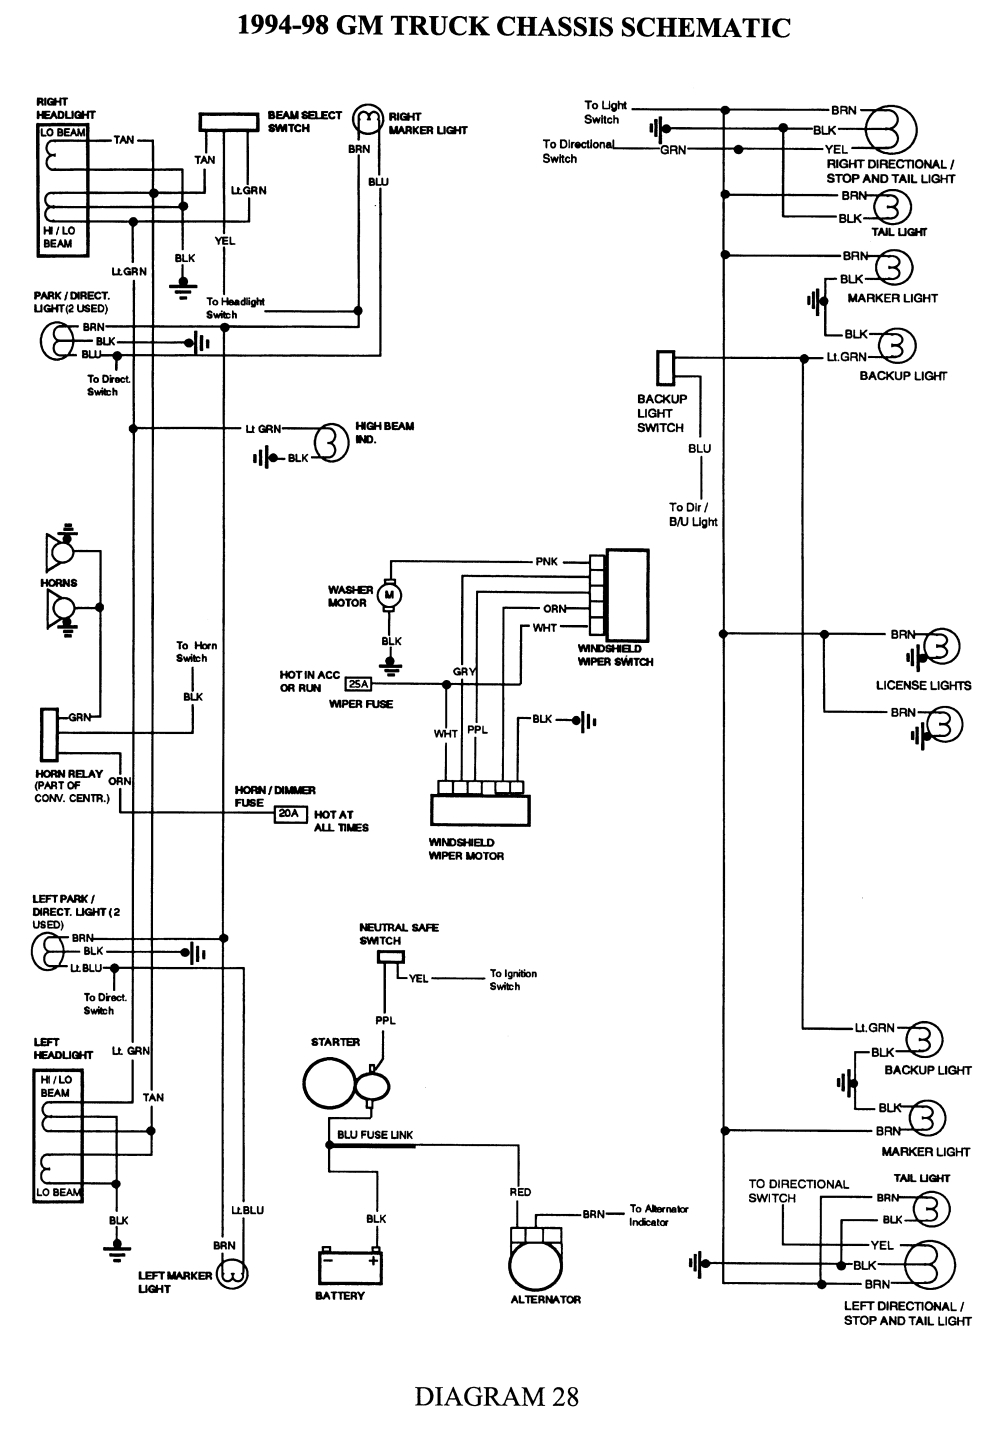 1995 chevy silverado 1500 wiring diagram how to read sequence gmc harness 19 stromoeko de truck schematic rh 76 3dpd co sierra